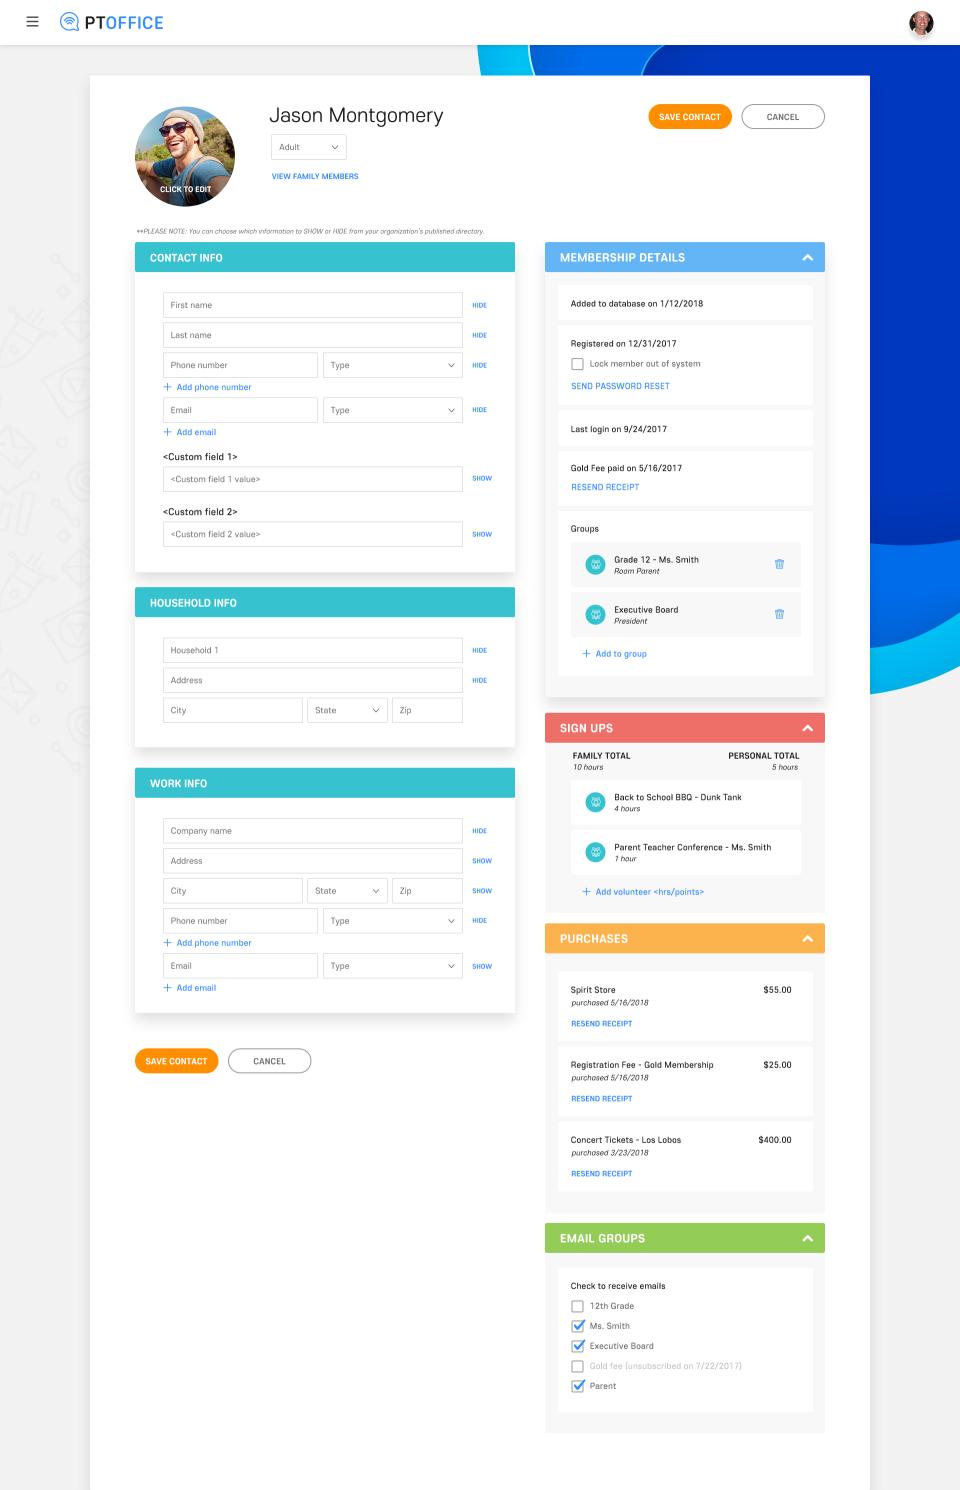 Sample Contact Profile